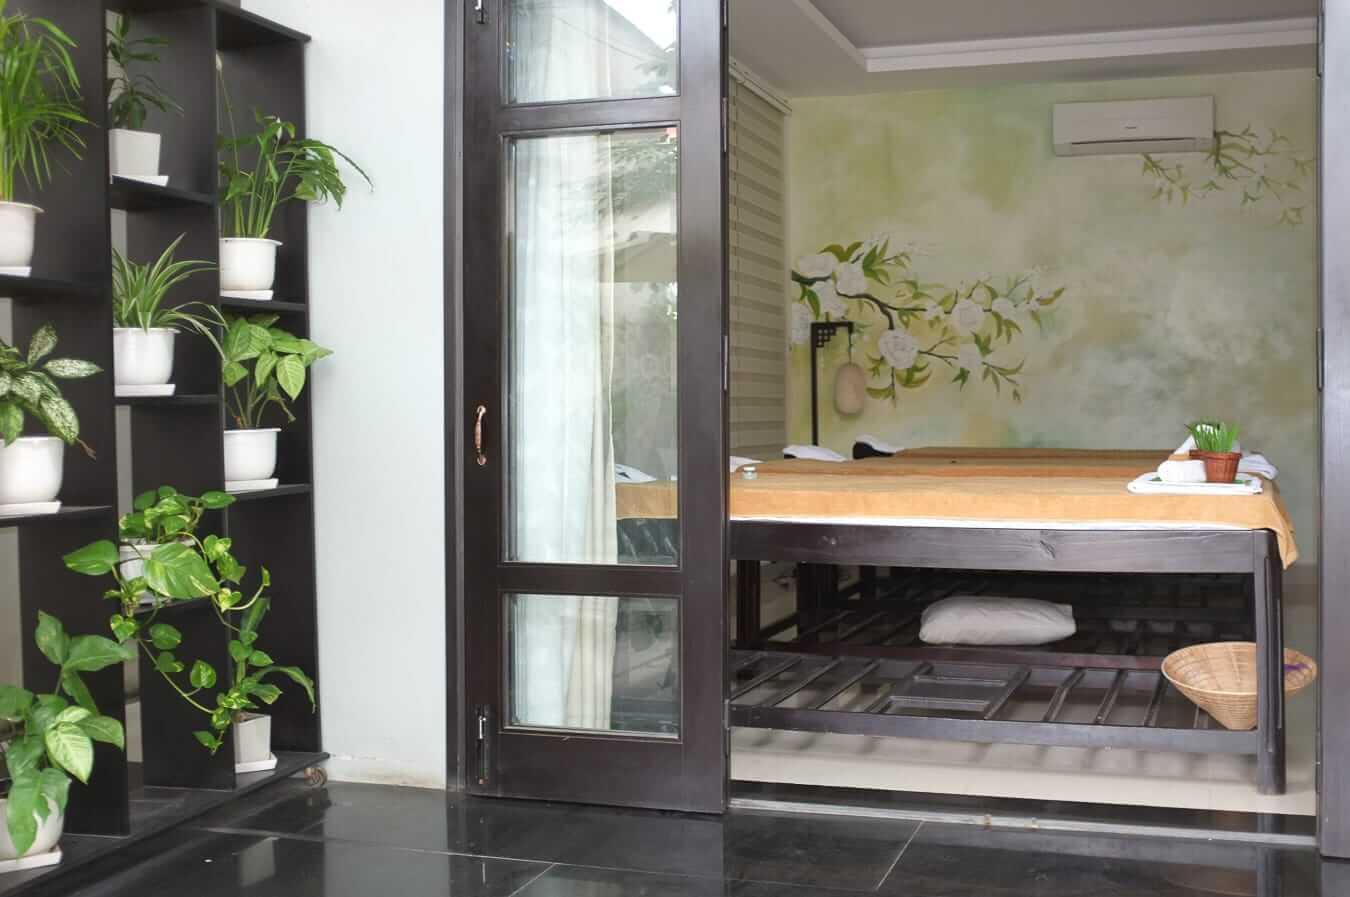 Phu Thinh Jasmine Spa:best spas in Hoi An